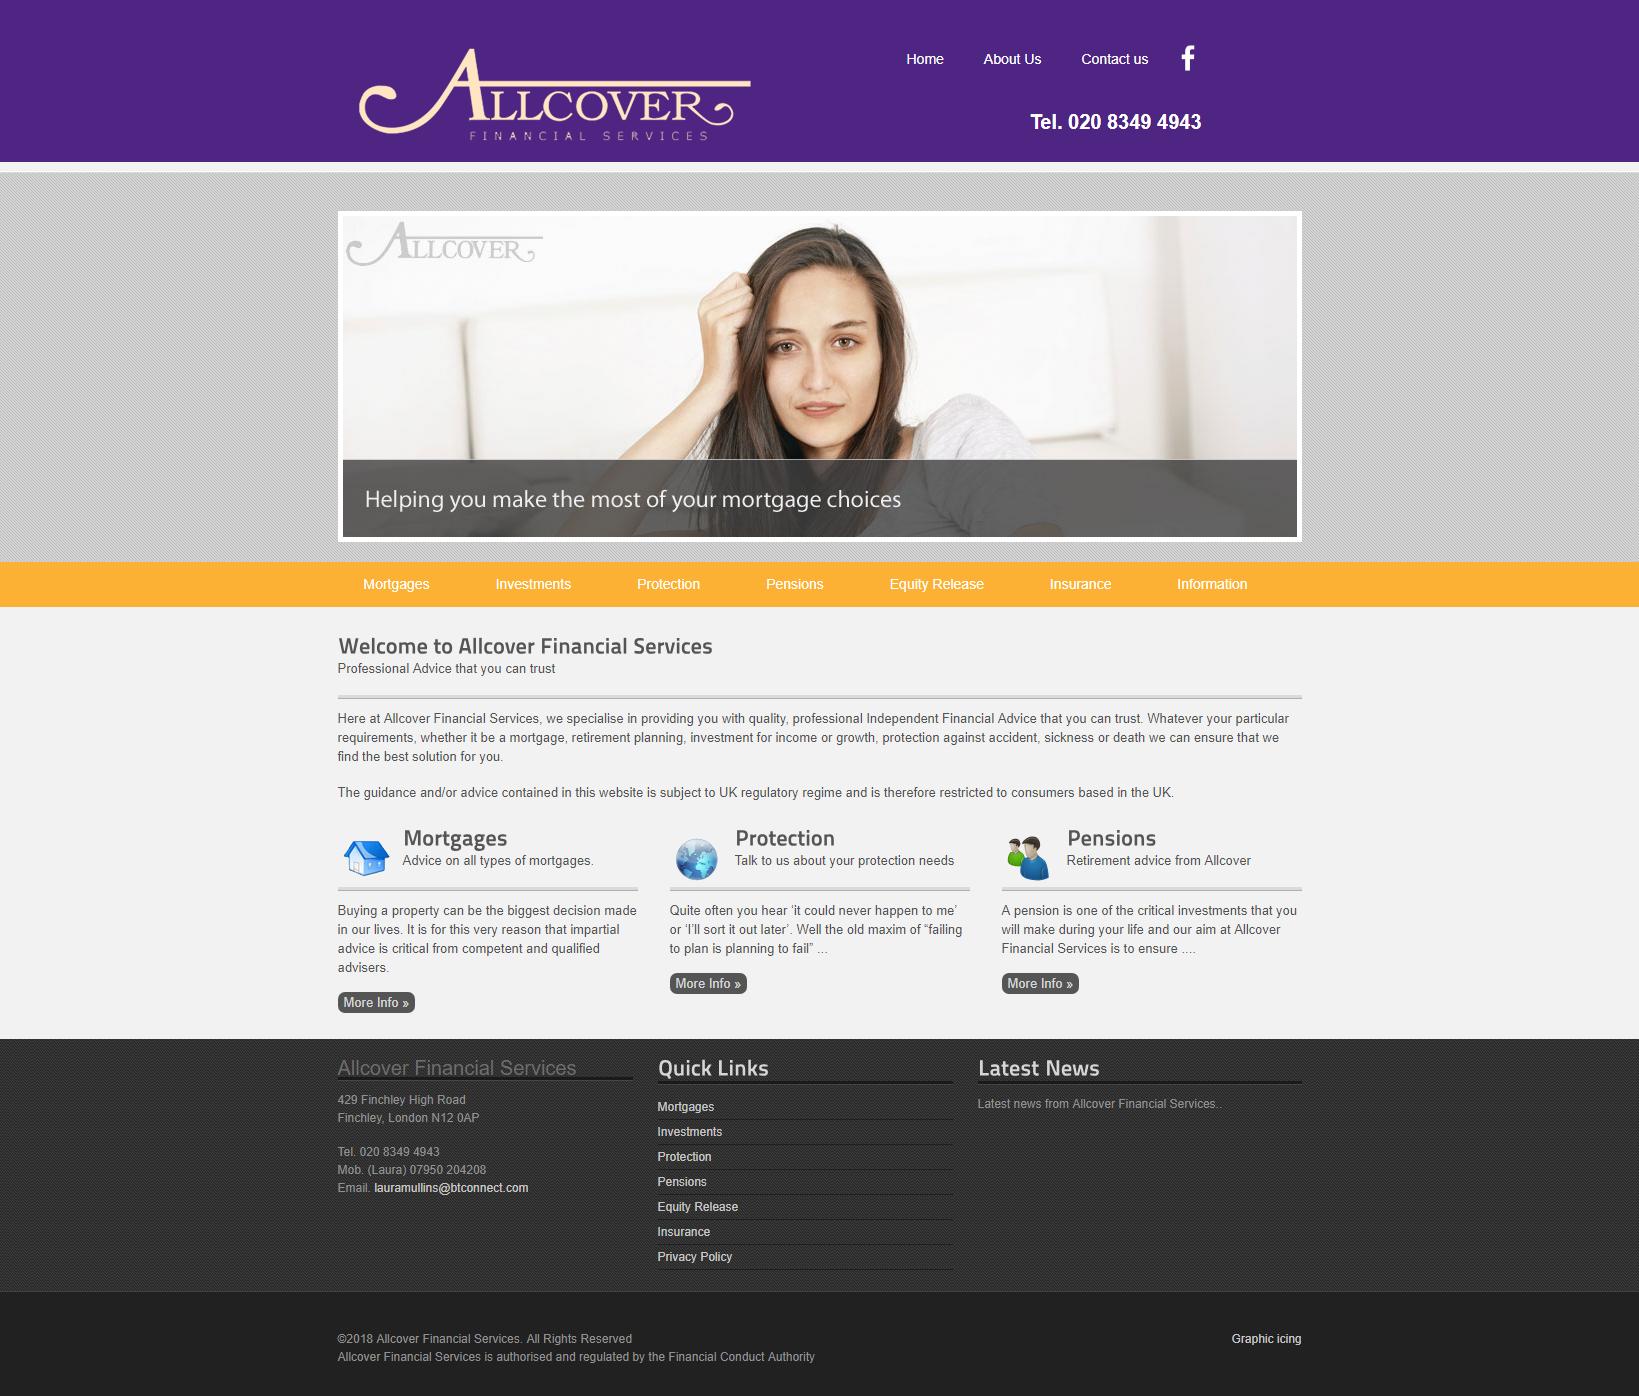 Allcover website design update